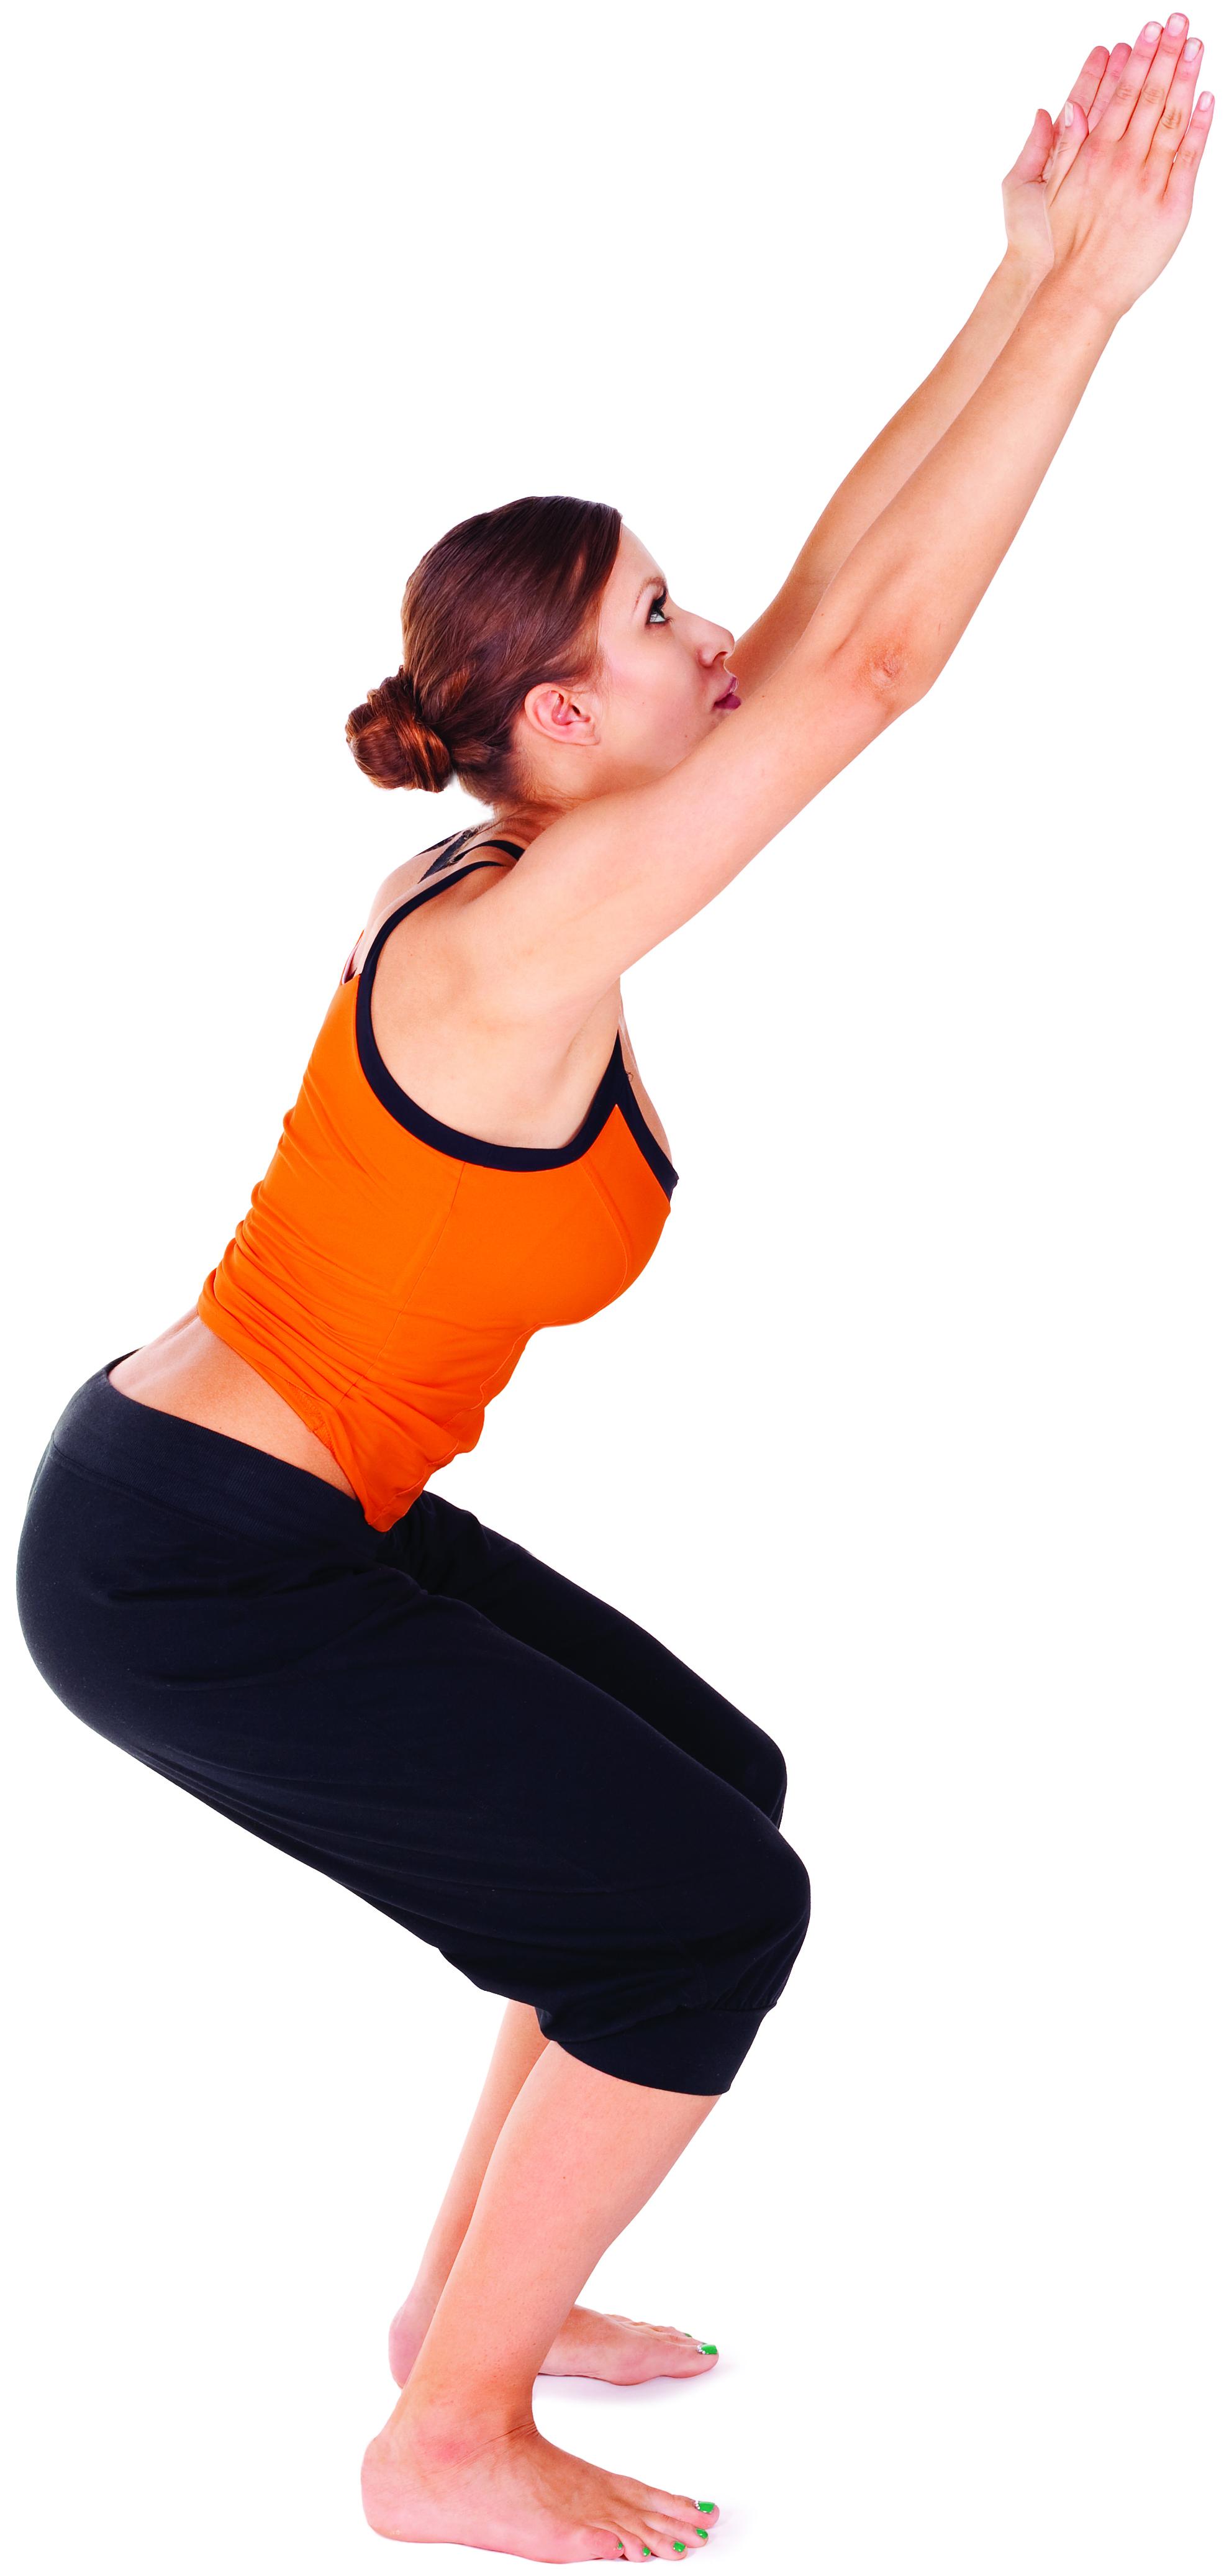 CHAIR POSE - Yoga Magazine